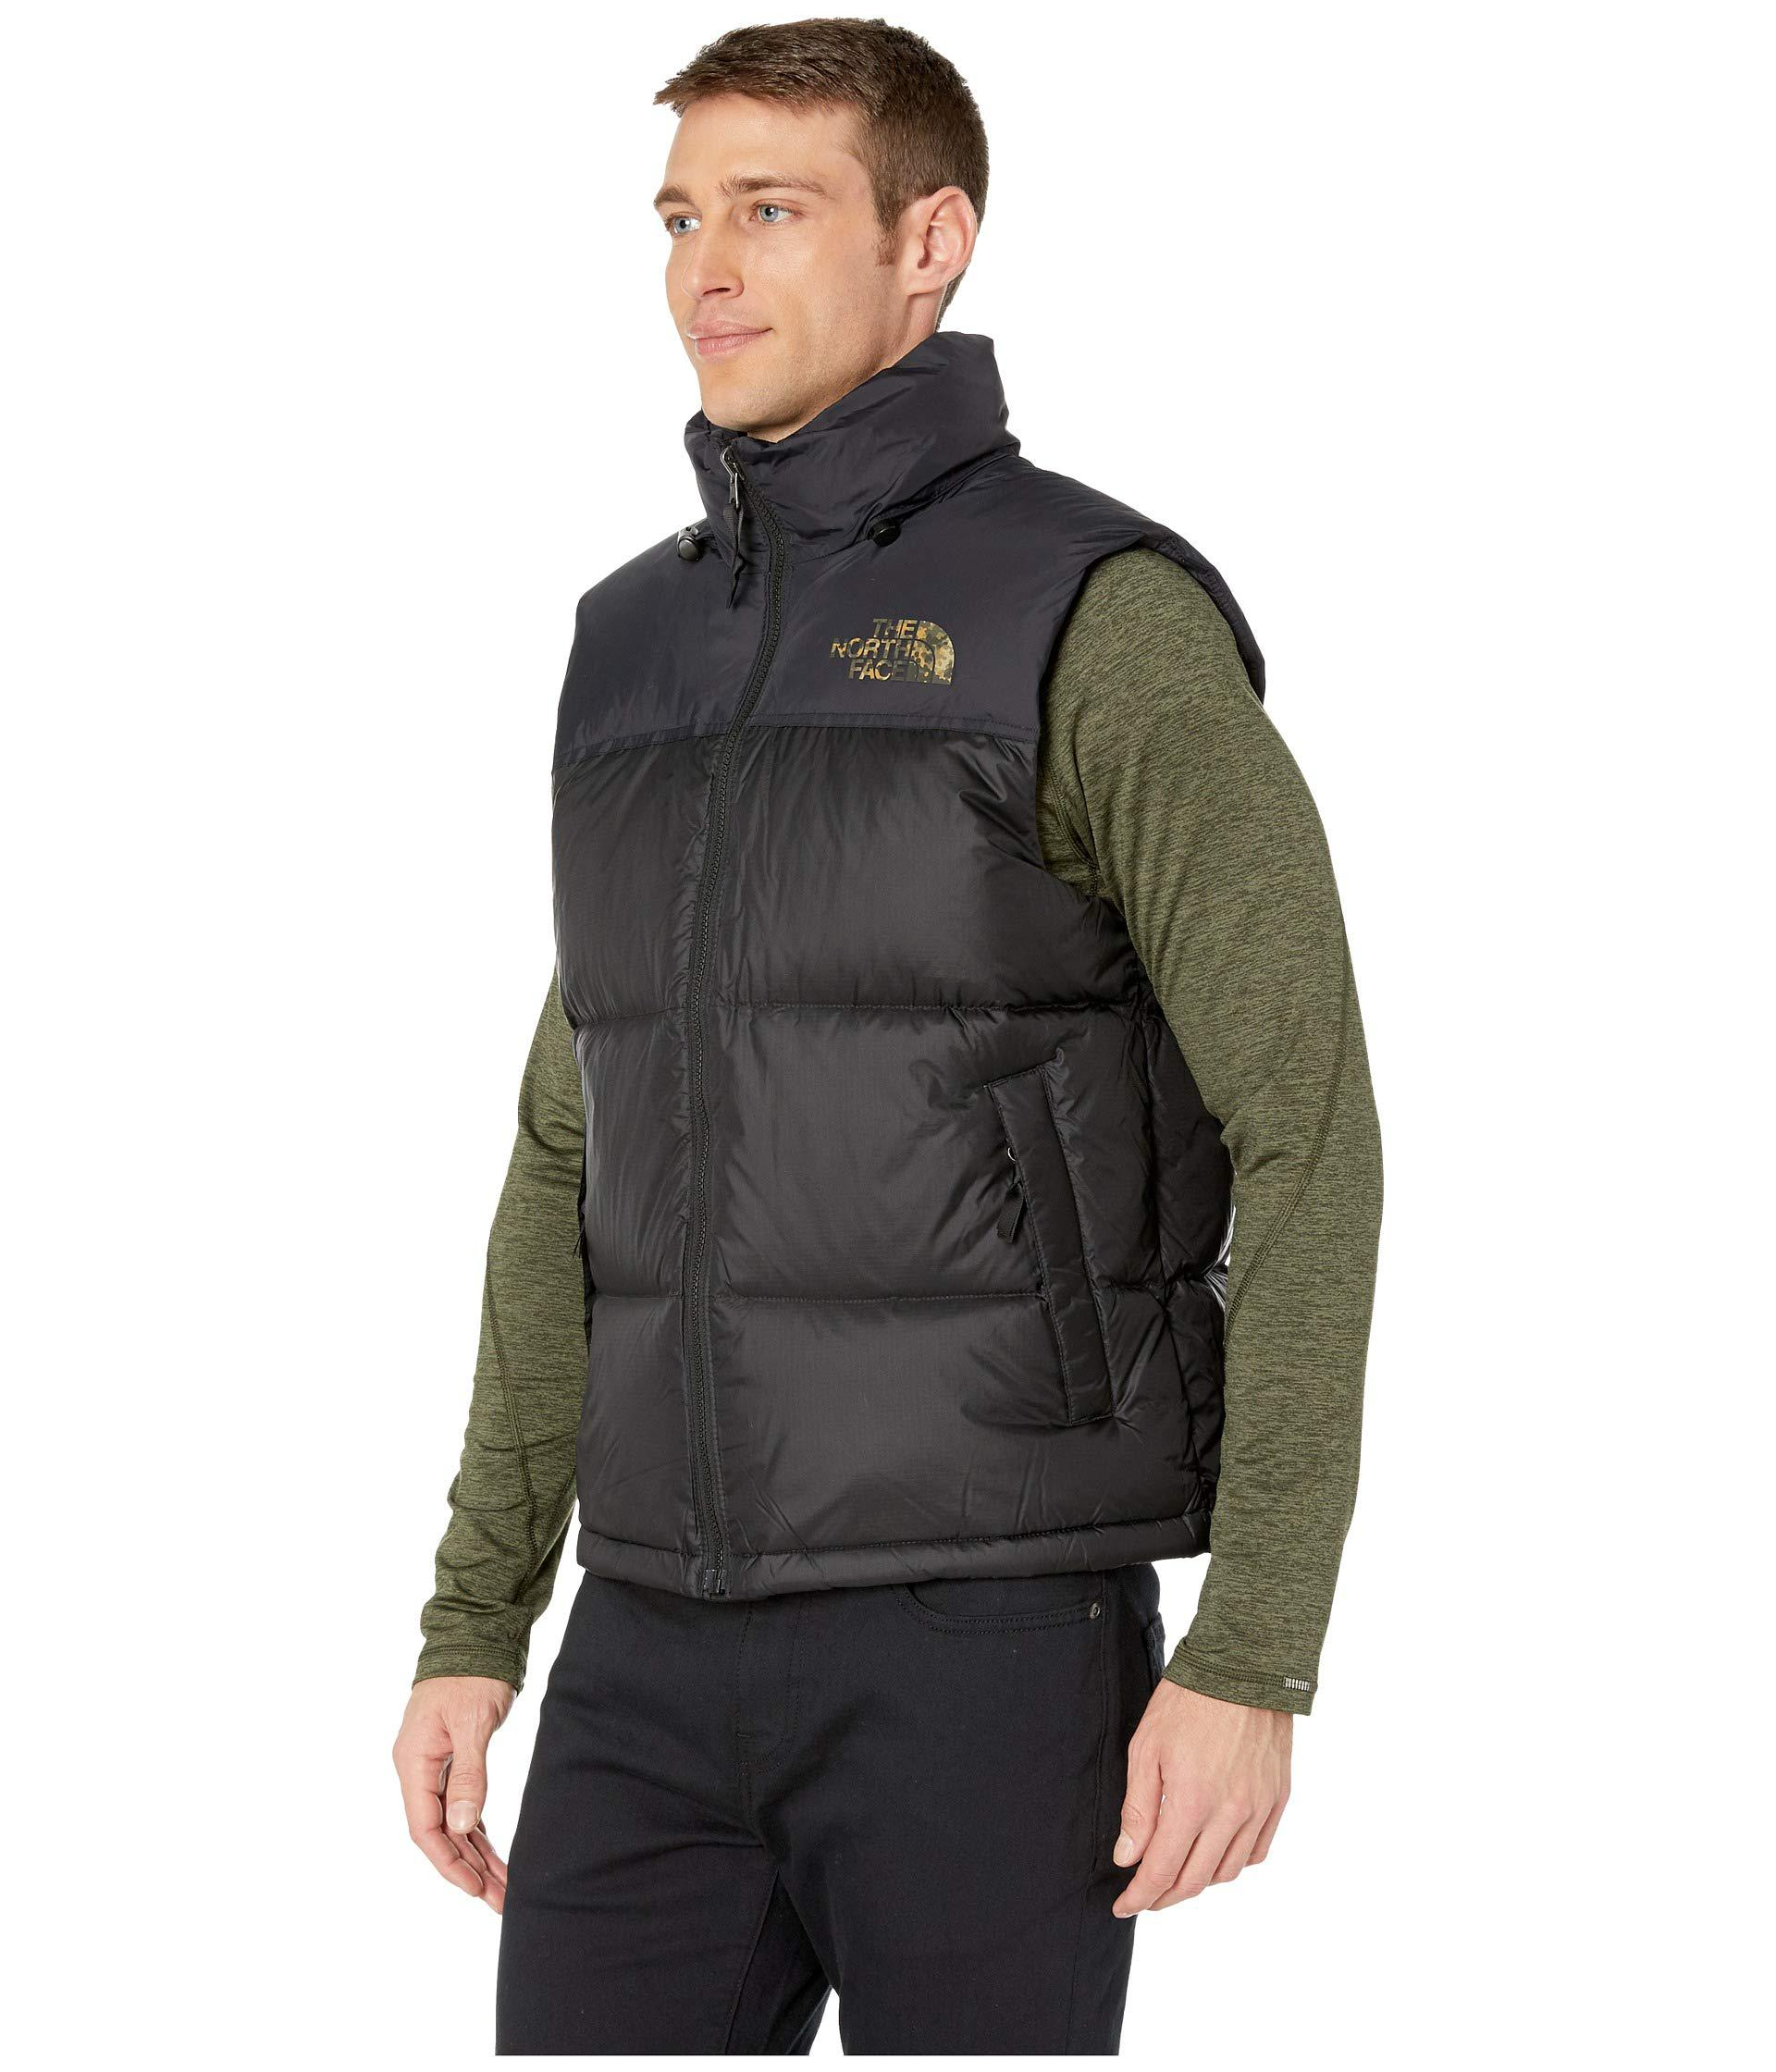 3aefb582f752 Lyst - The North Face 1996 Retro Novelty Nuptse Vest (tnf Black Macrofleck  Print) Men s Vest in Black for Men